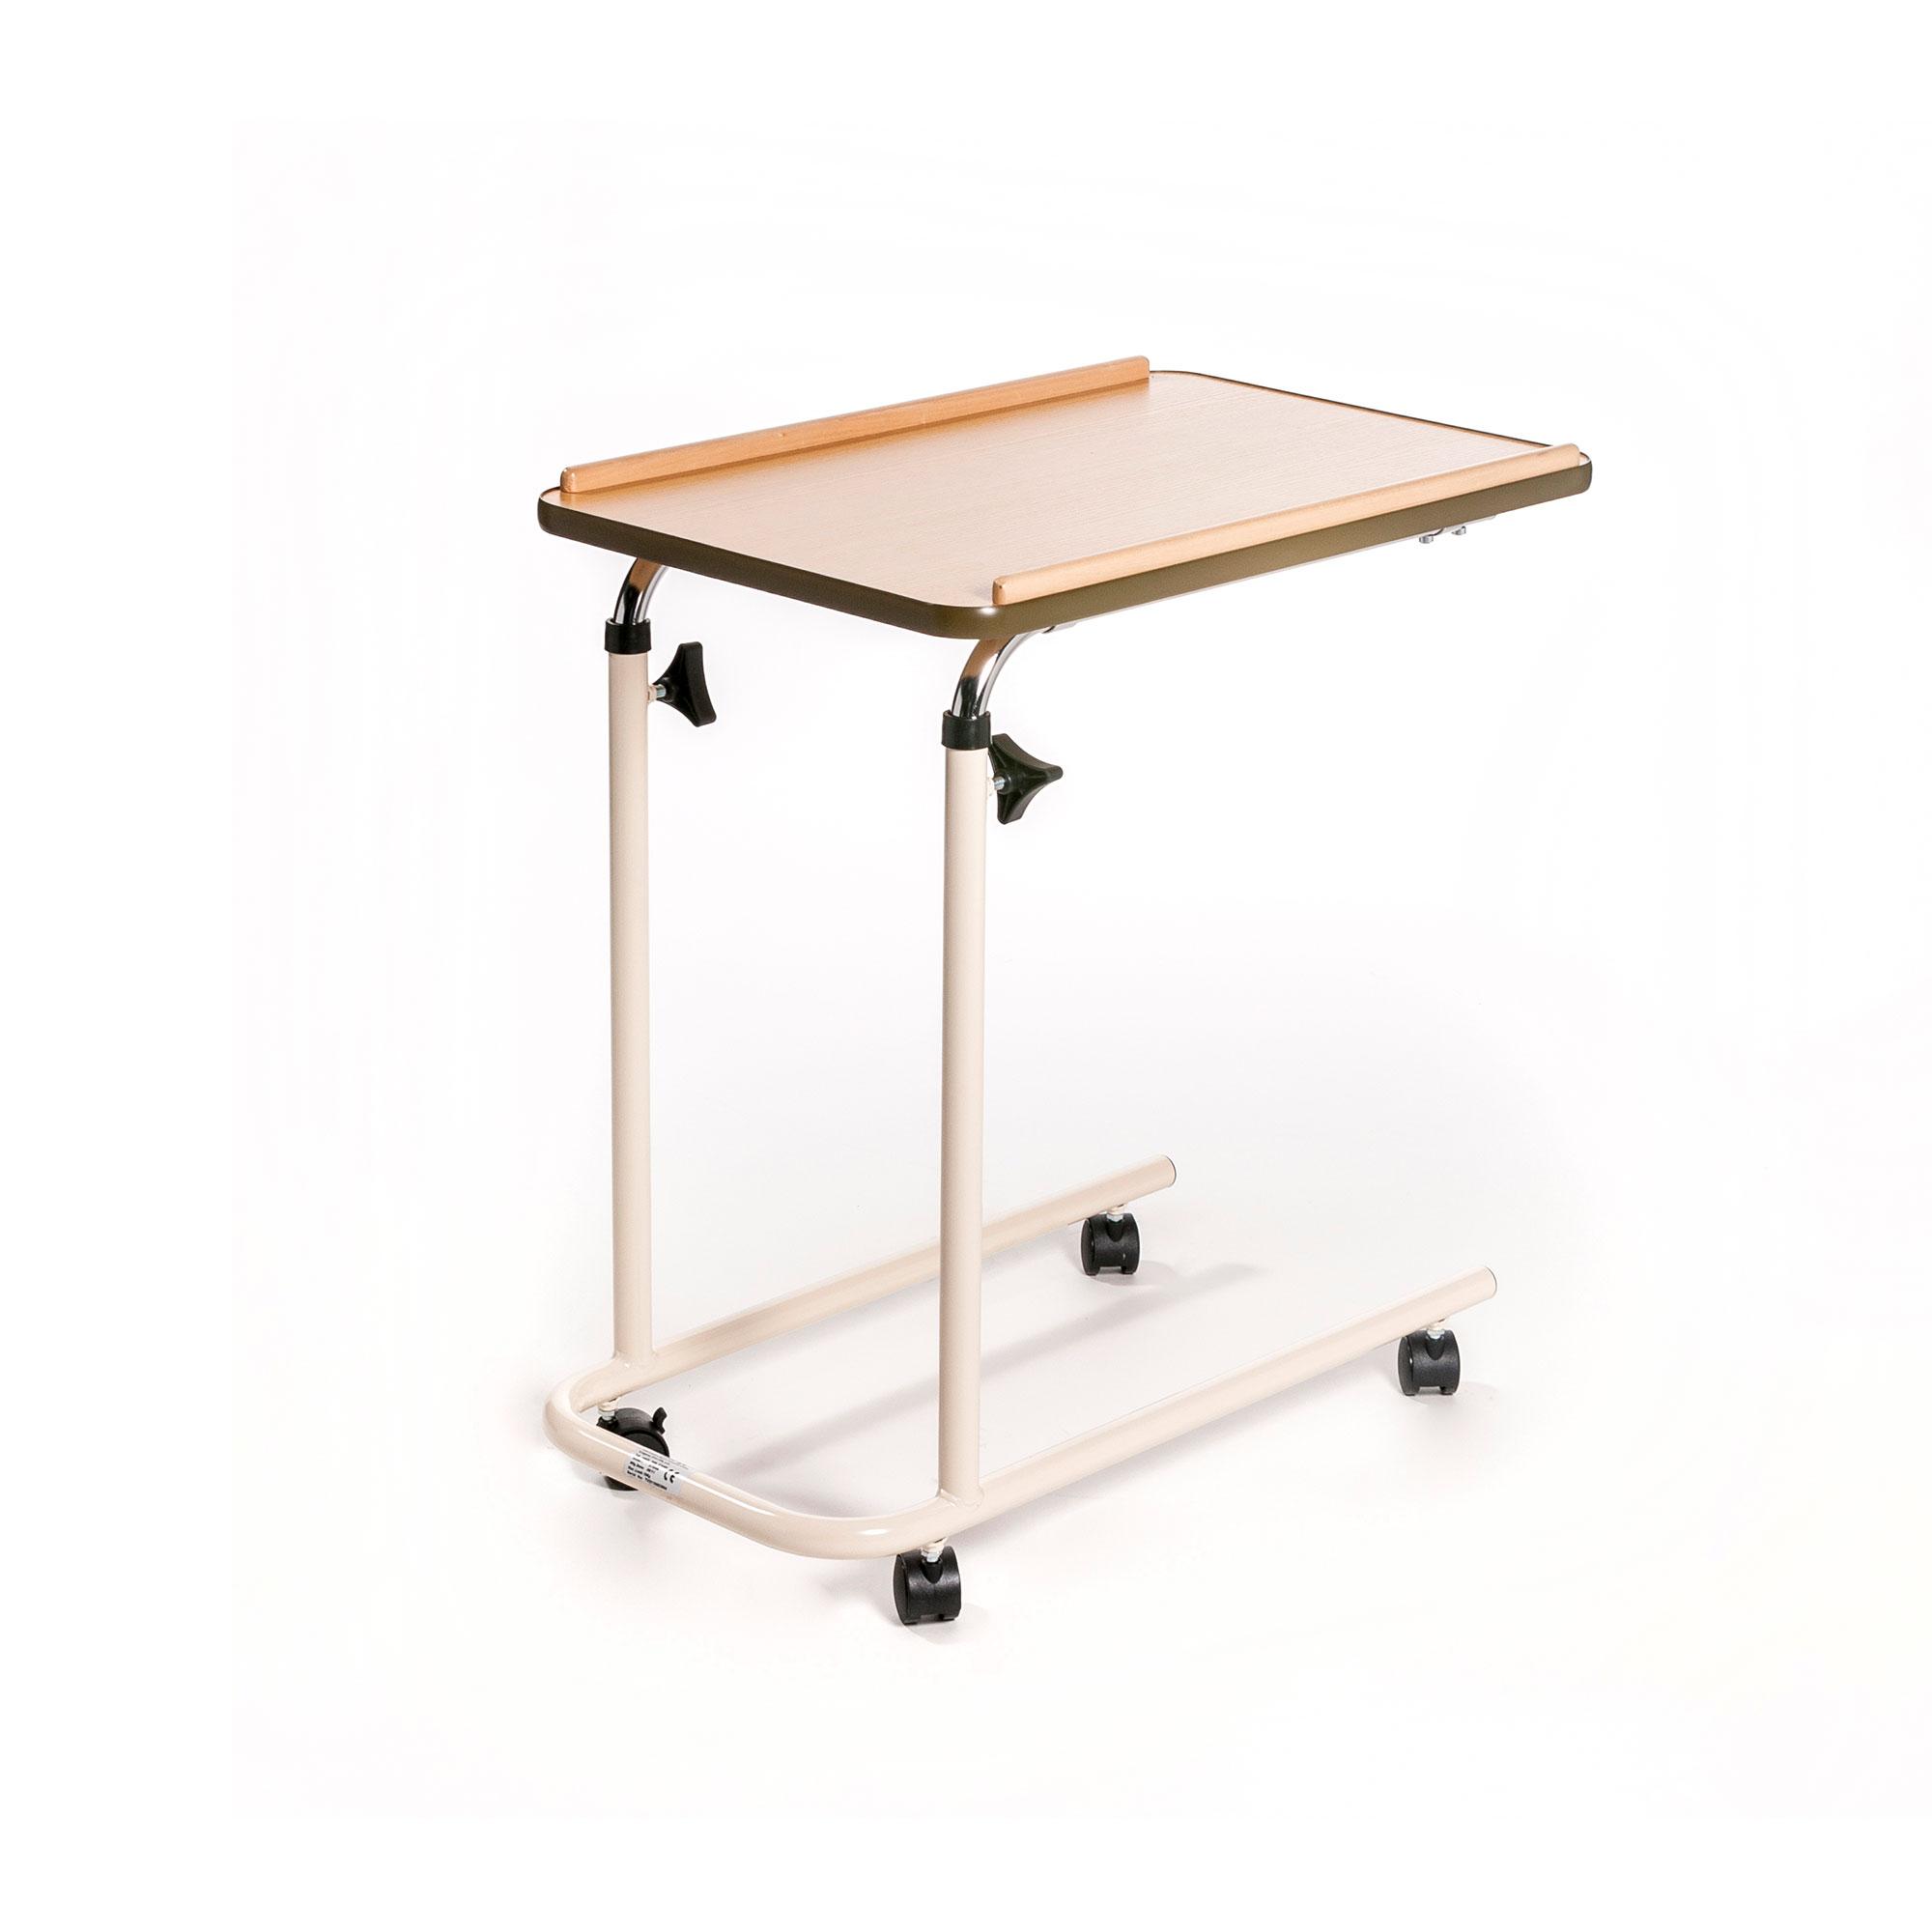 TABLE FOR BED CASTORS BEIGE 77 - 117 CM 10 KG MAX